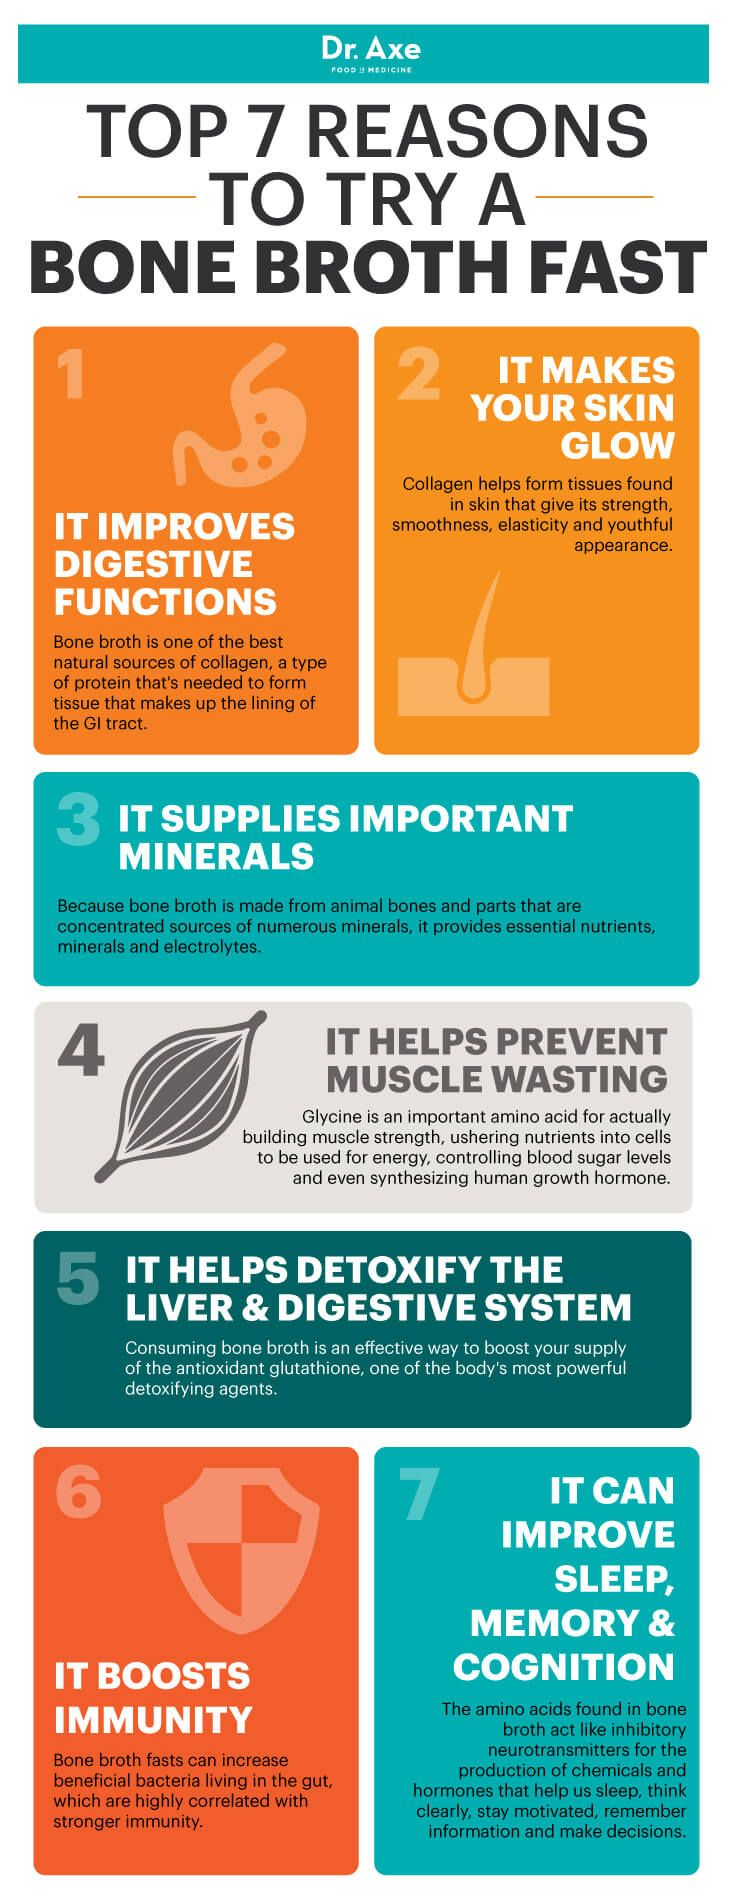 Bone broth fast benefits - Dr. Axe http://www.draxe.com #health #holistic #natural